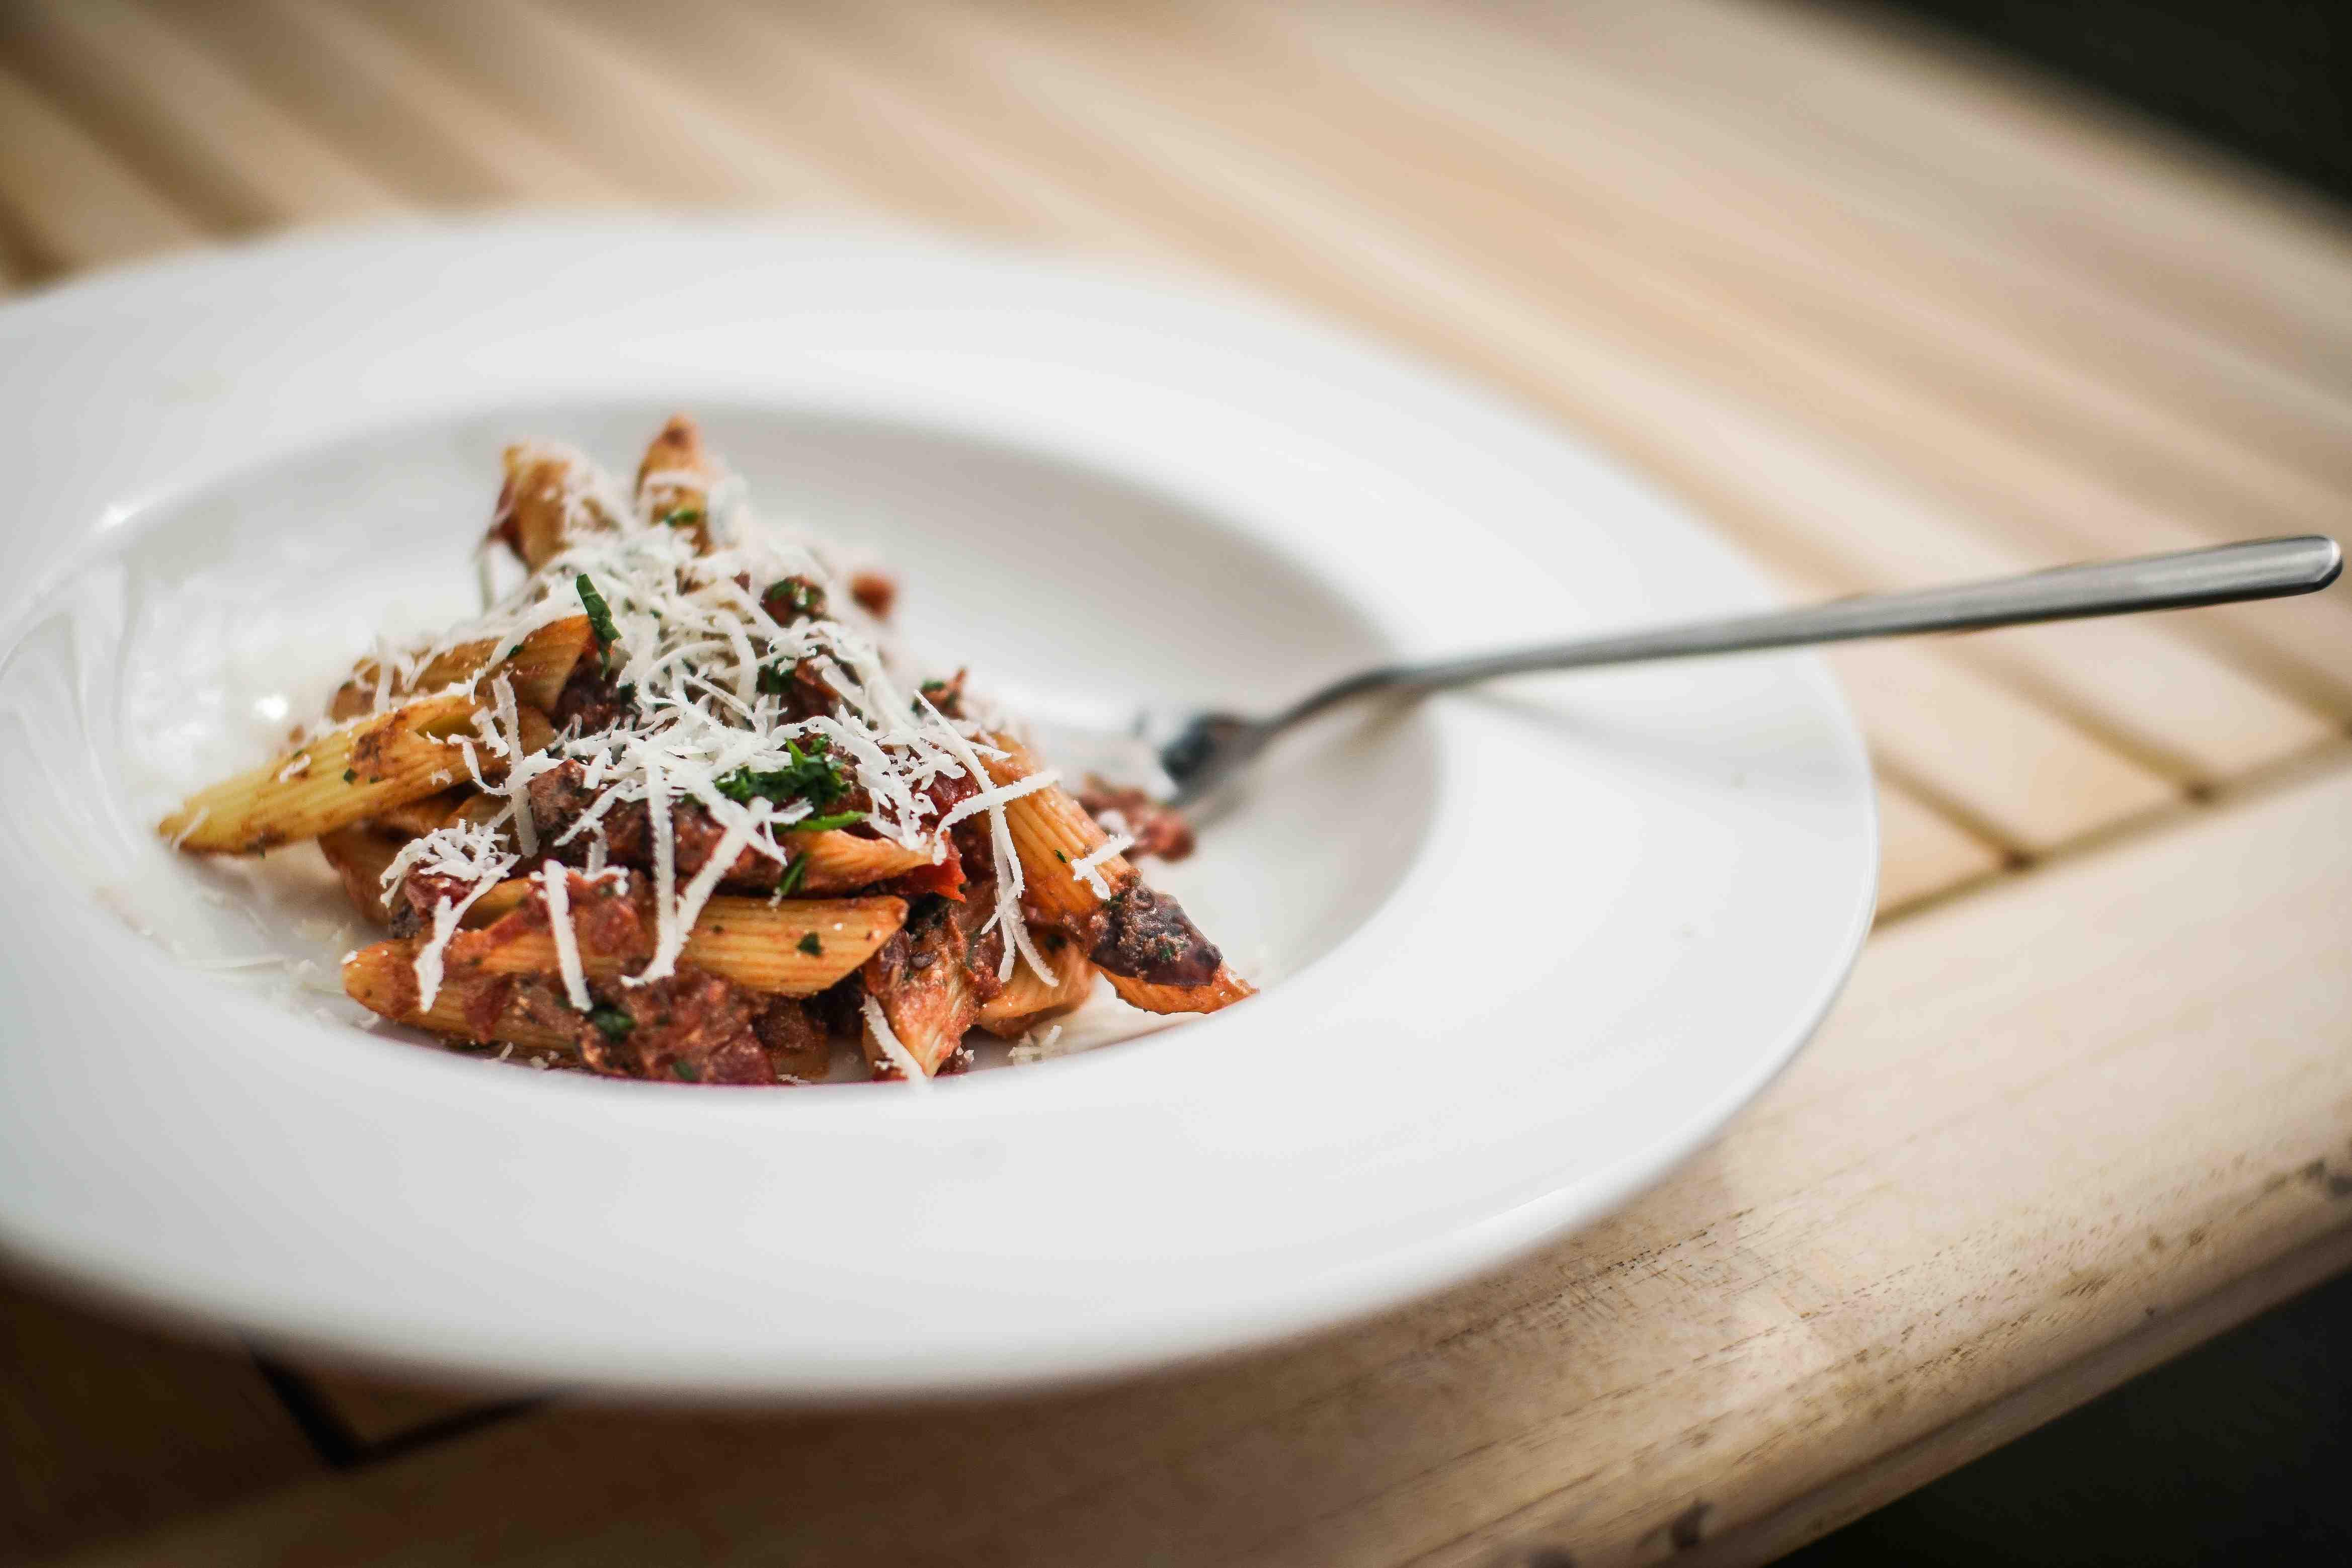 siktwinfood: Pennette in Padella Leckere Pasta mit Auberginen in Rotwein-Tomatensauce und Parmesan